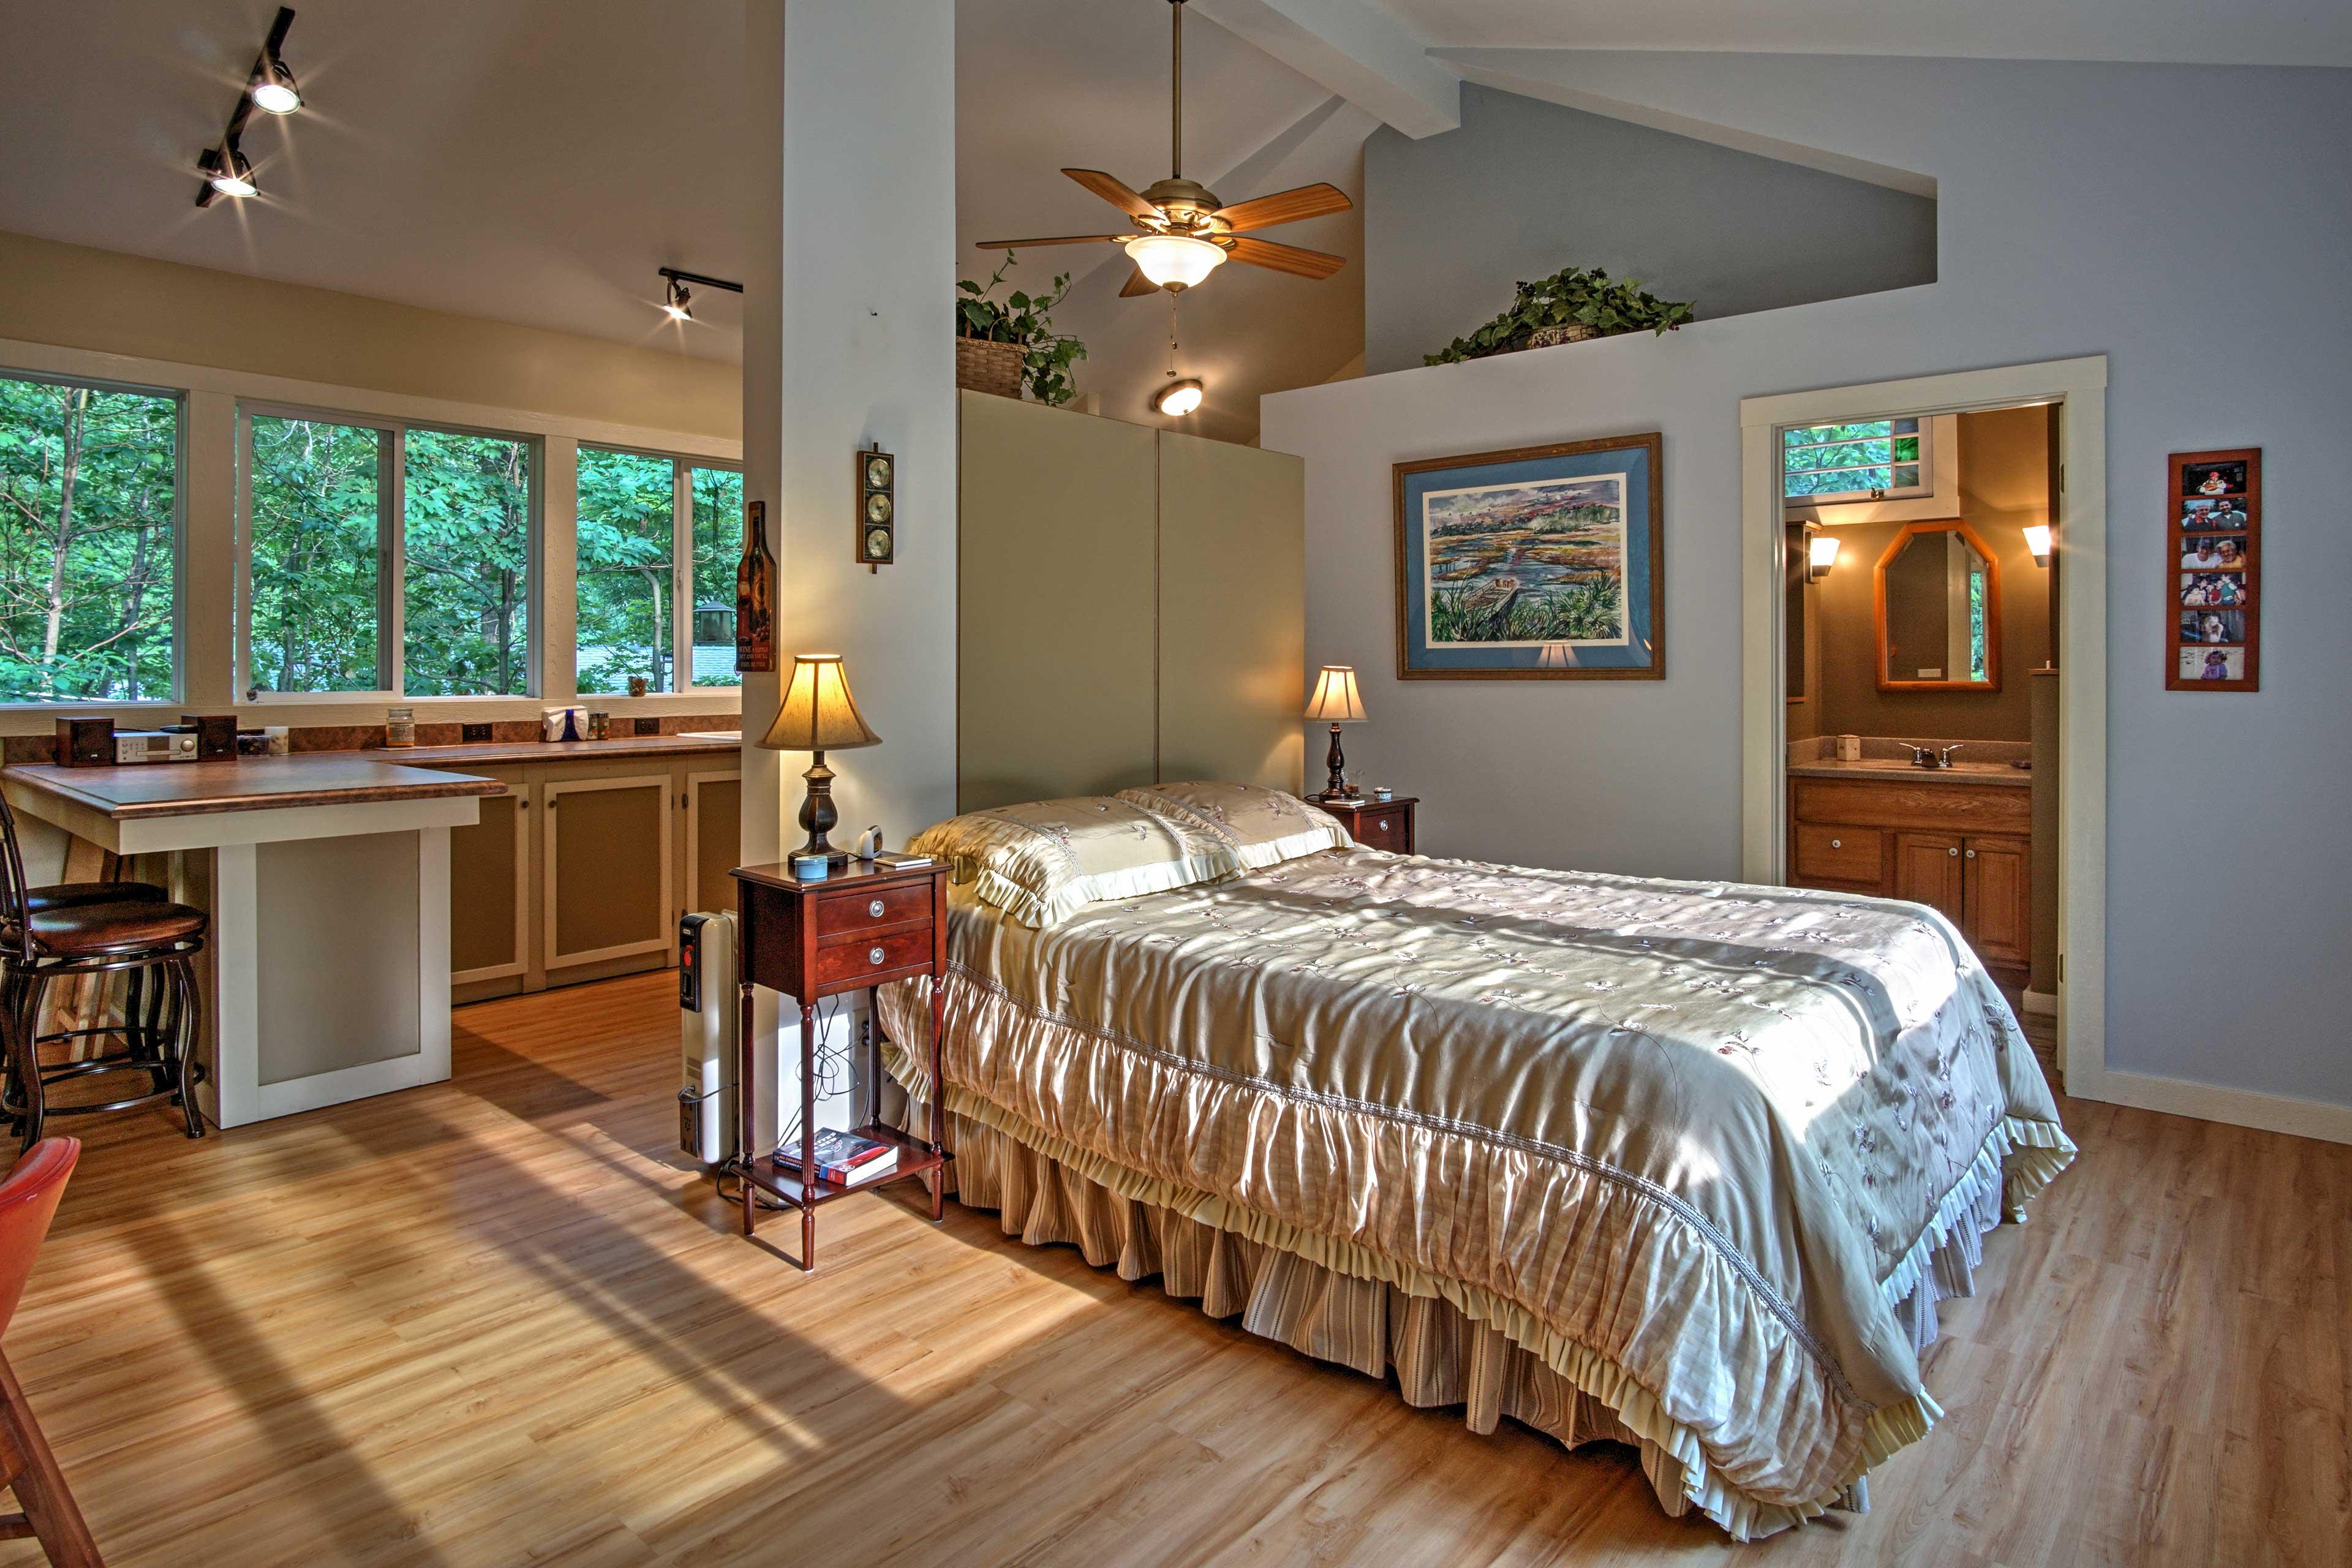 Enjoy restful nights of sleep in the plush queen bed.